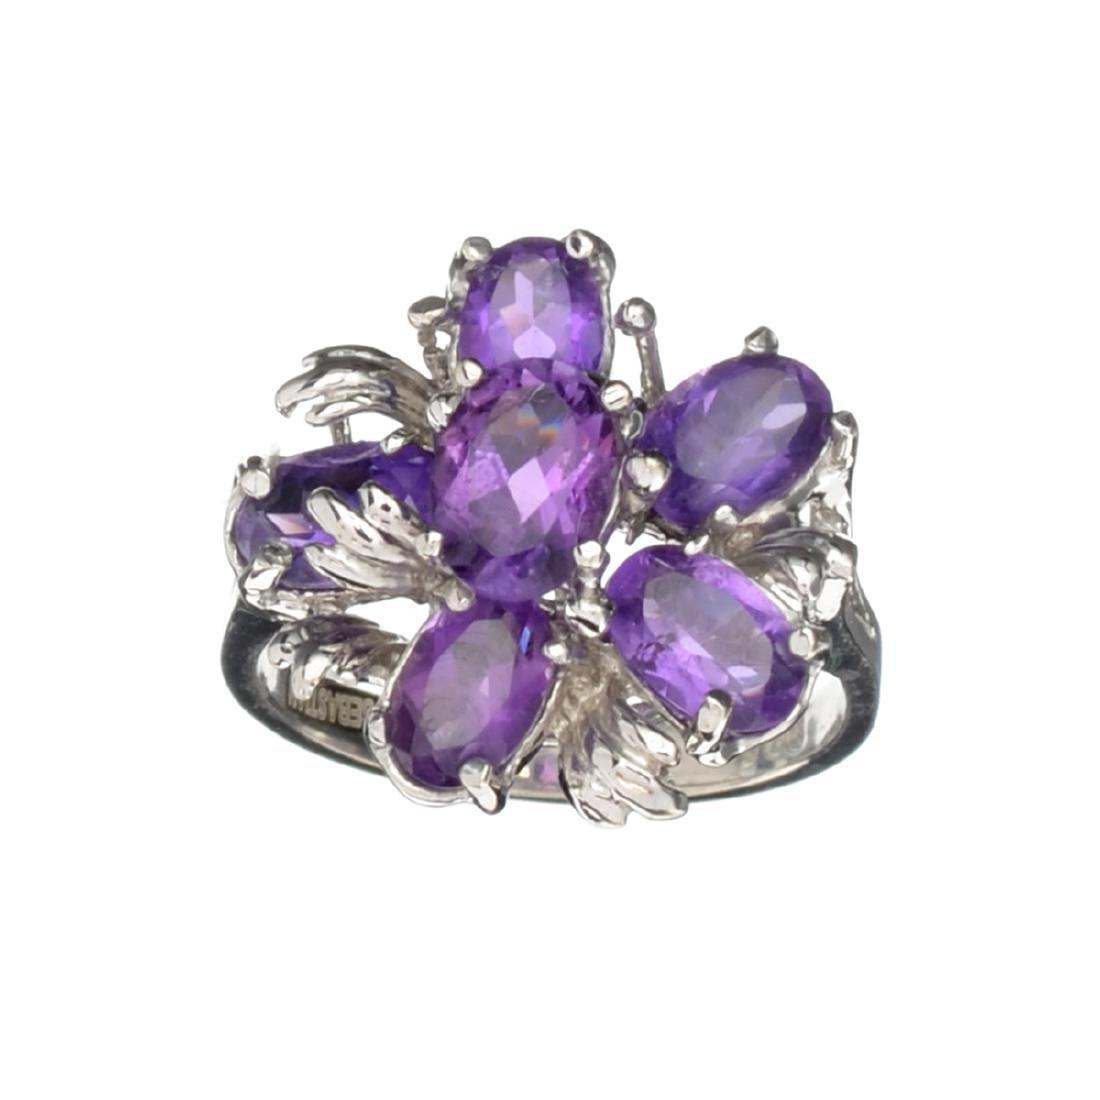 APP: 0.5k Fine Jewelry Designer Sebastian, 2.60CT Oval